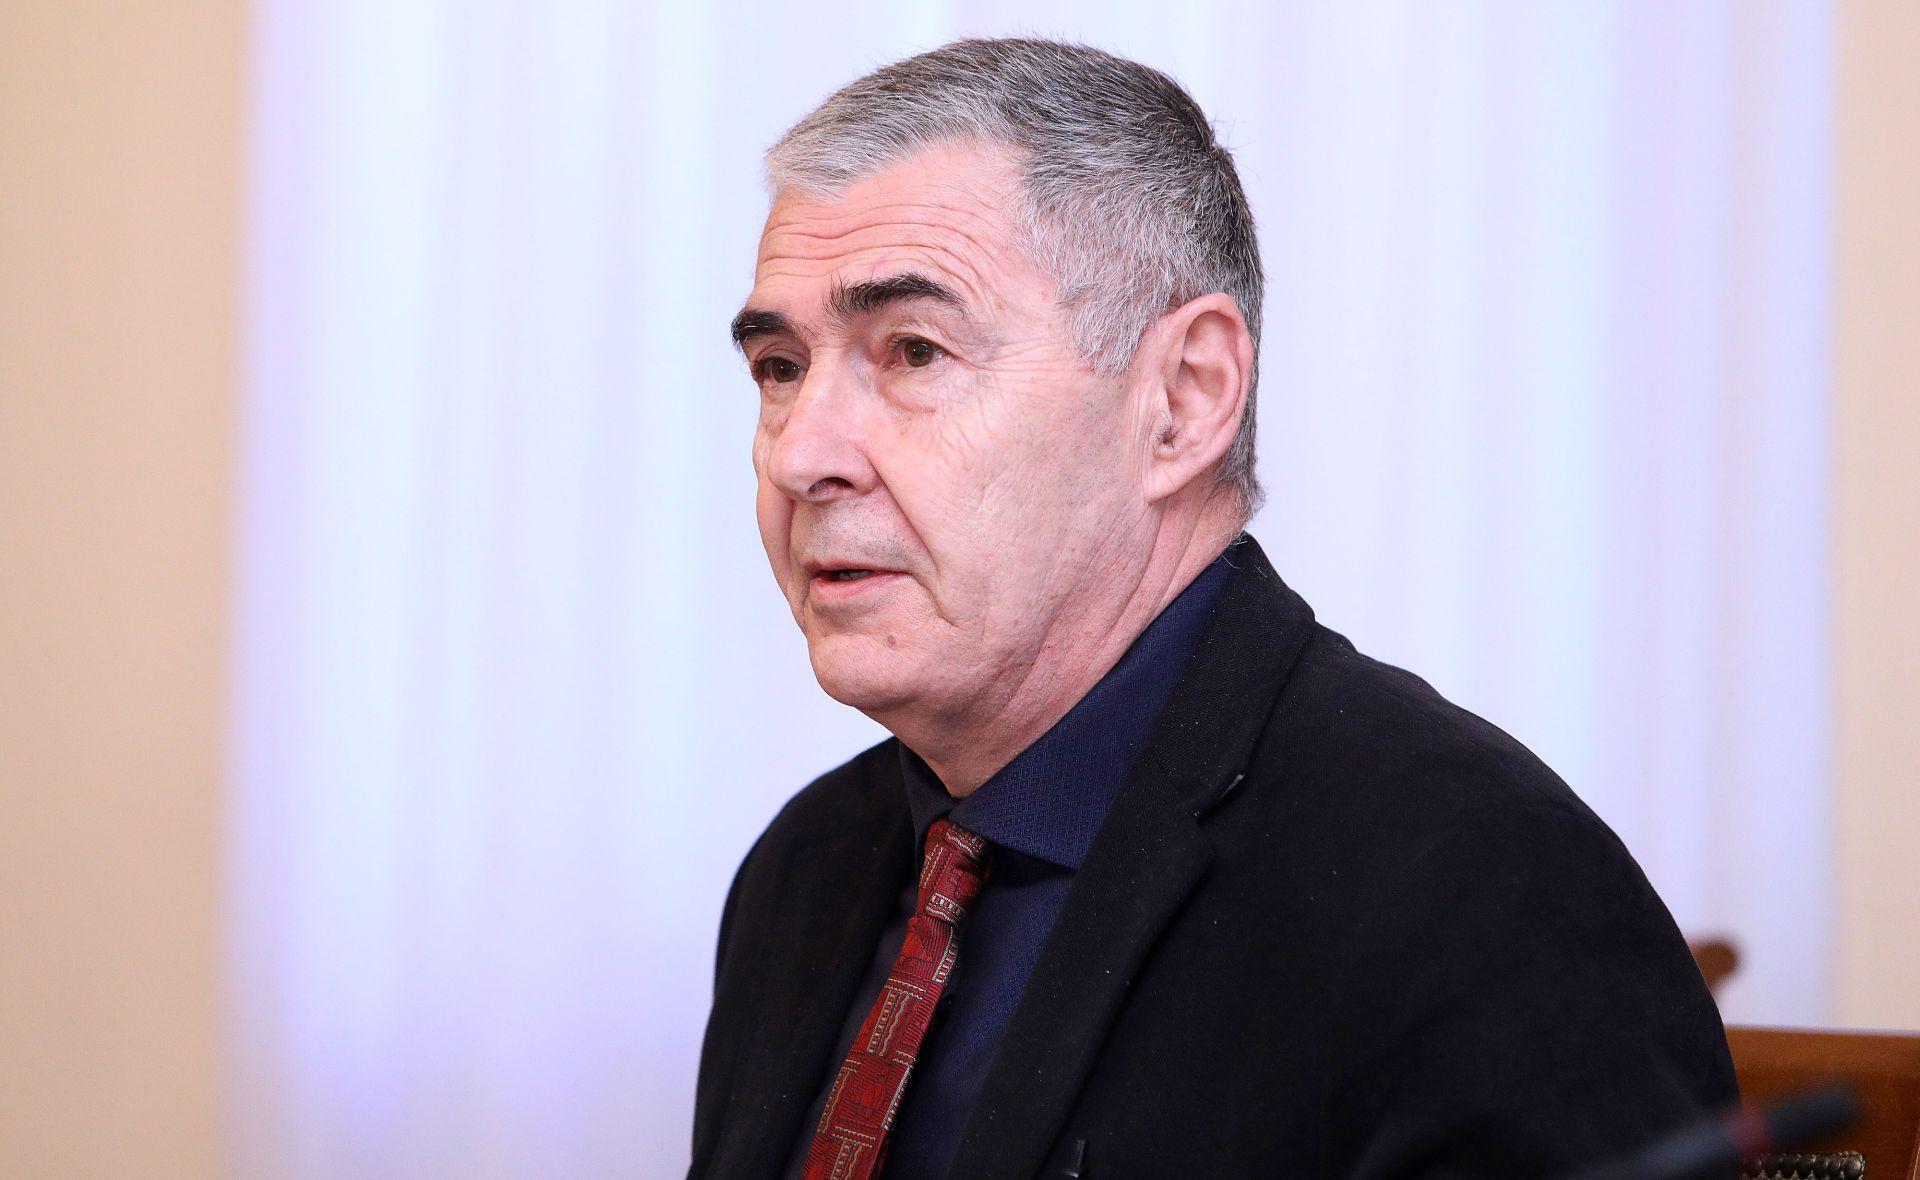 Saborski zastupnik Glasnović na Facebooku odaje počast vojsci NDH